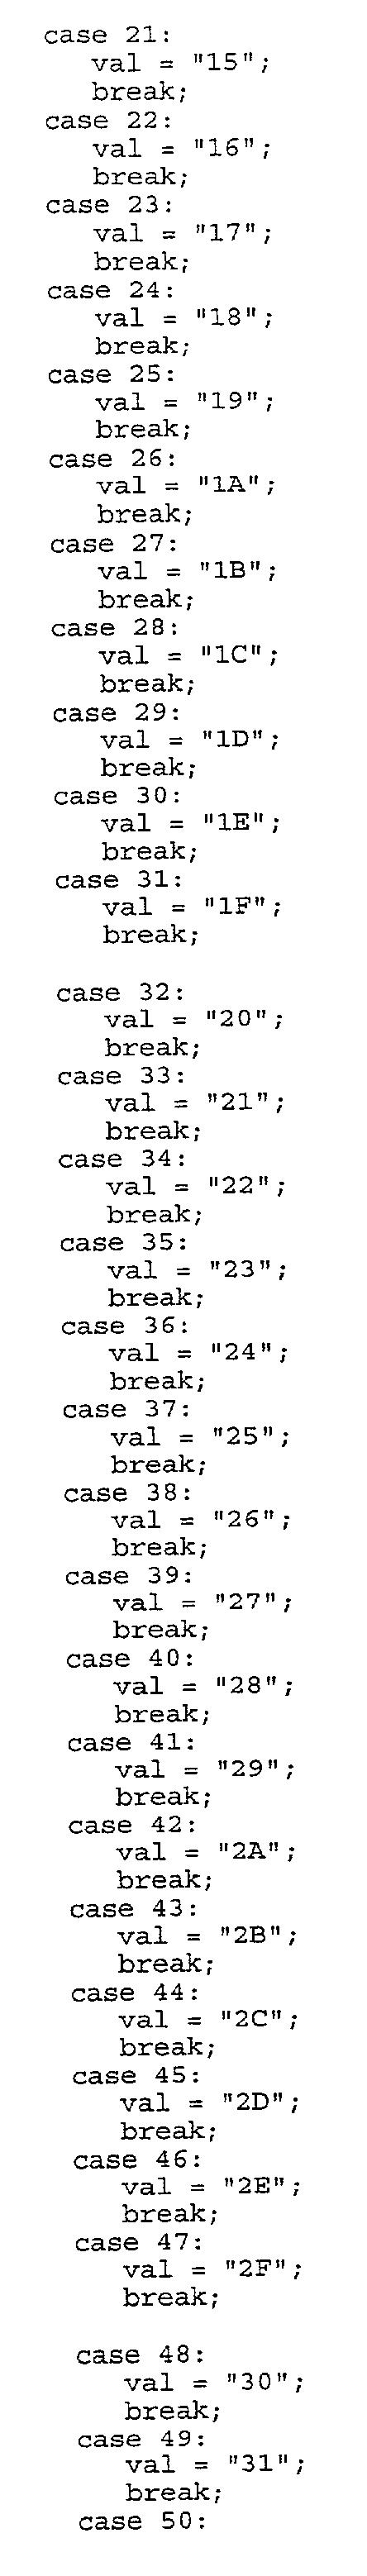 Figure US20020113824A1-20020822-P00153